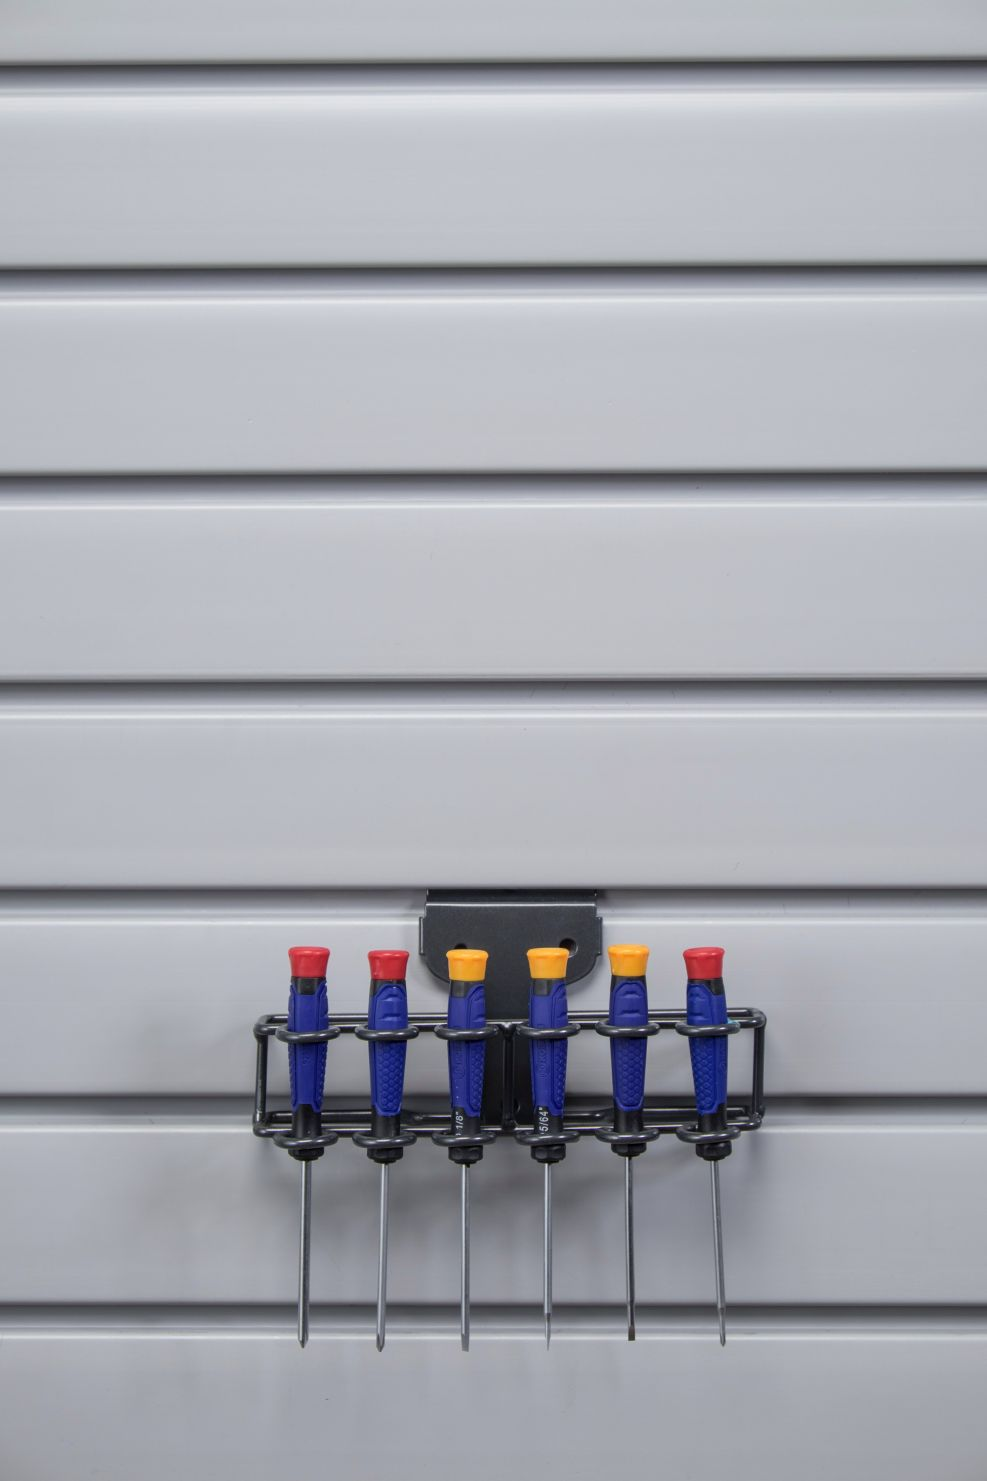 Garage Organization Systems Amp Slatwall Storage In Phoenix Az